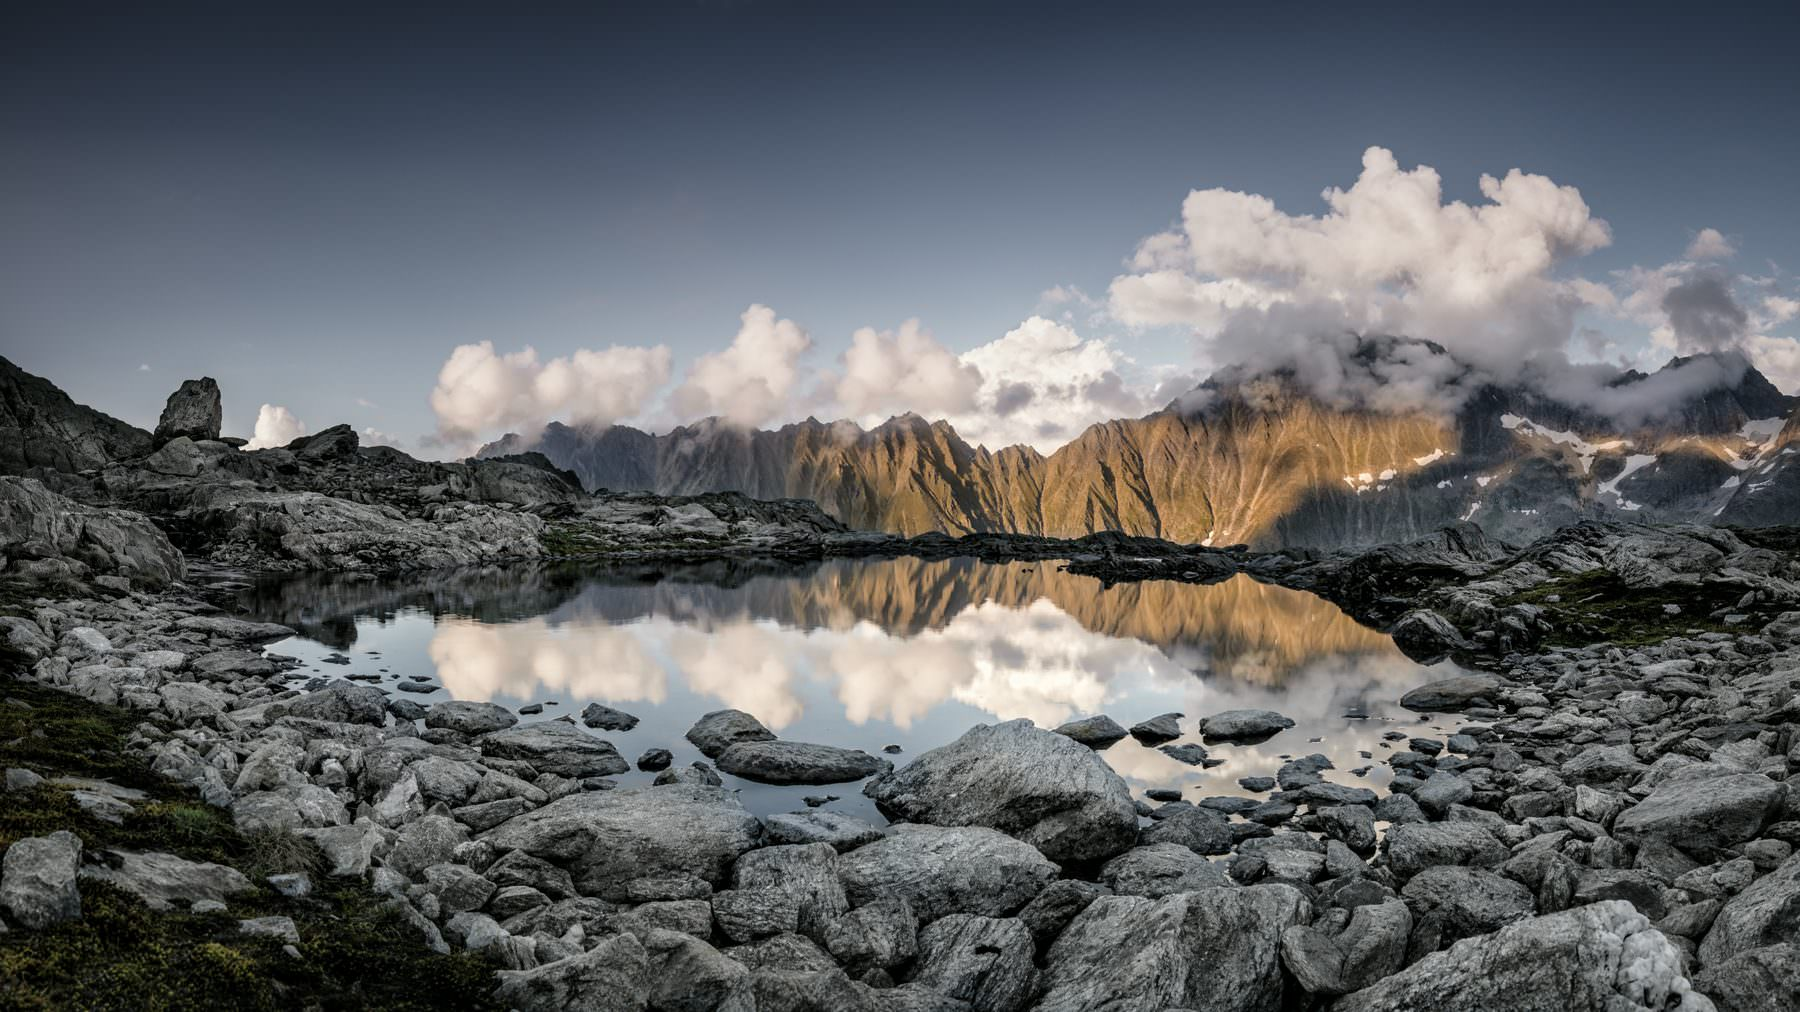 Gaulistöcke, Bergsee, Berneroberland, Schweiz